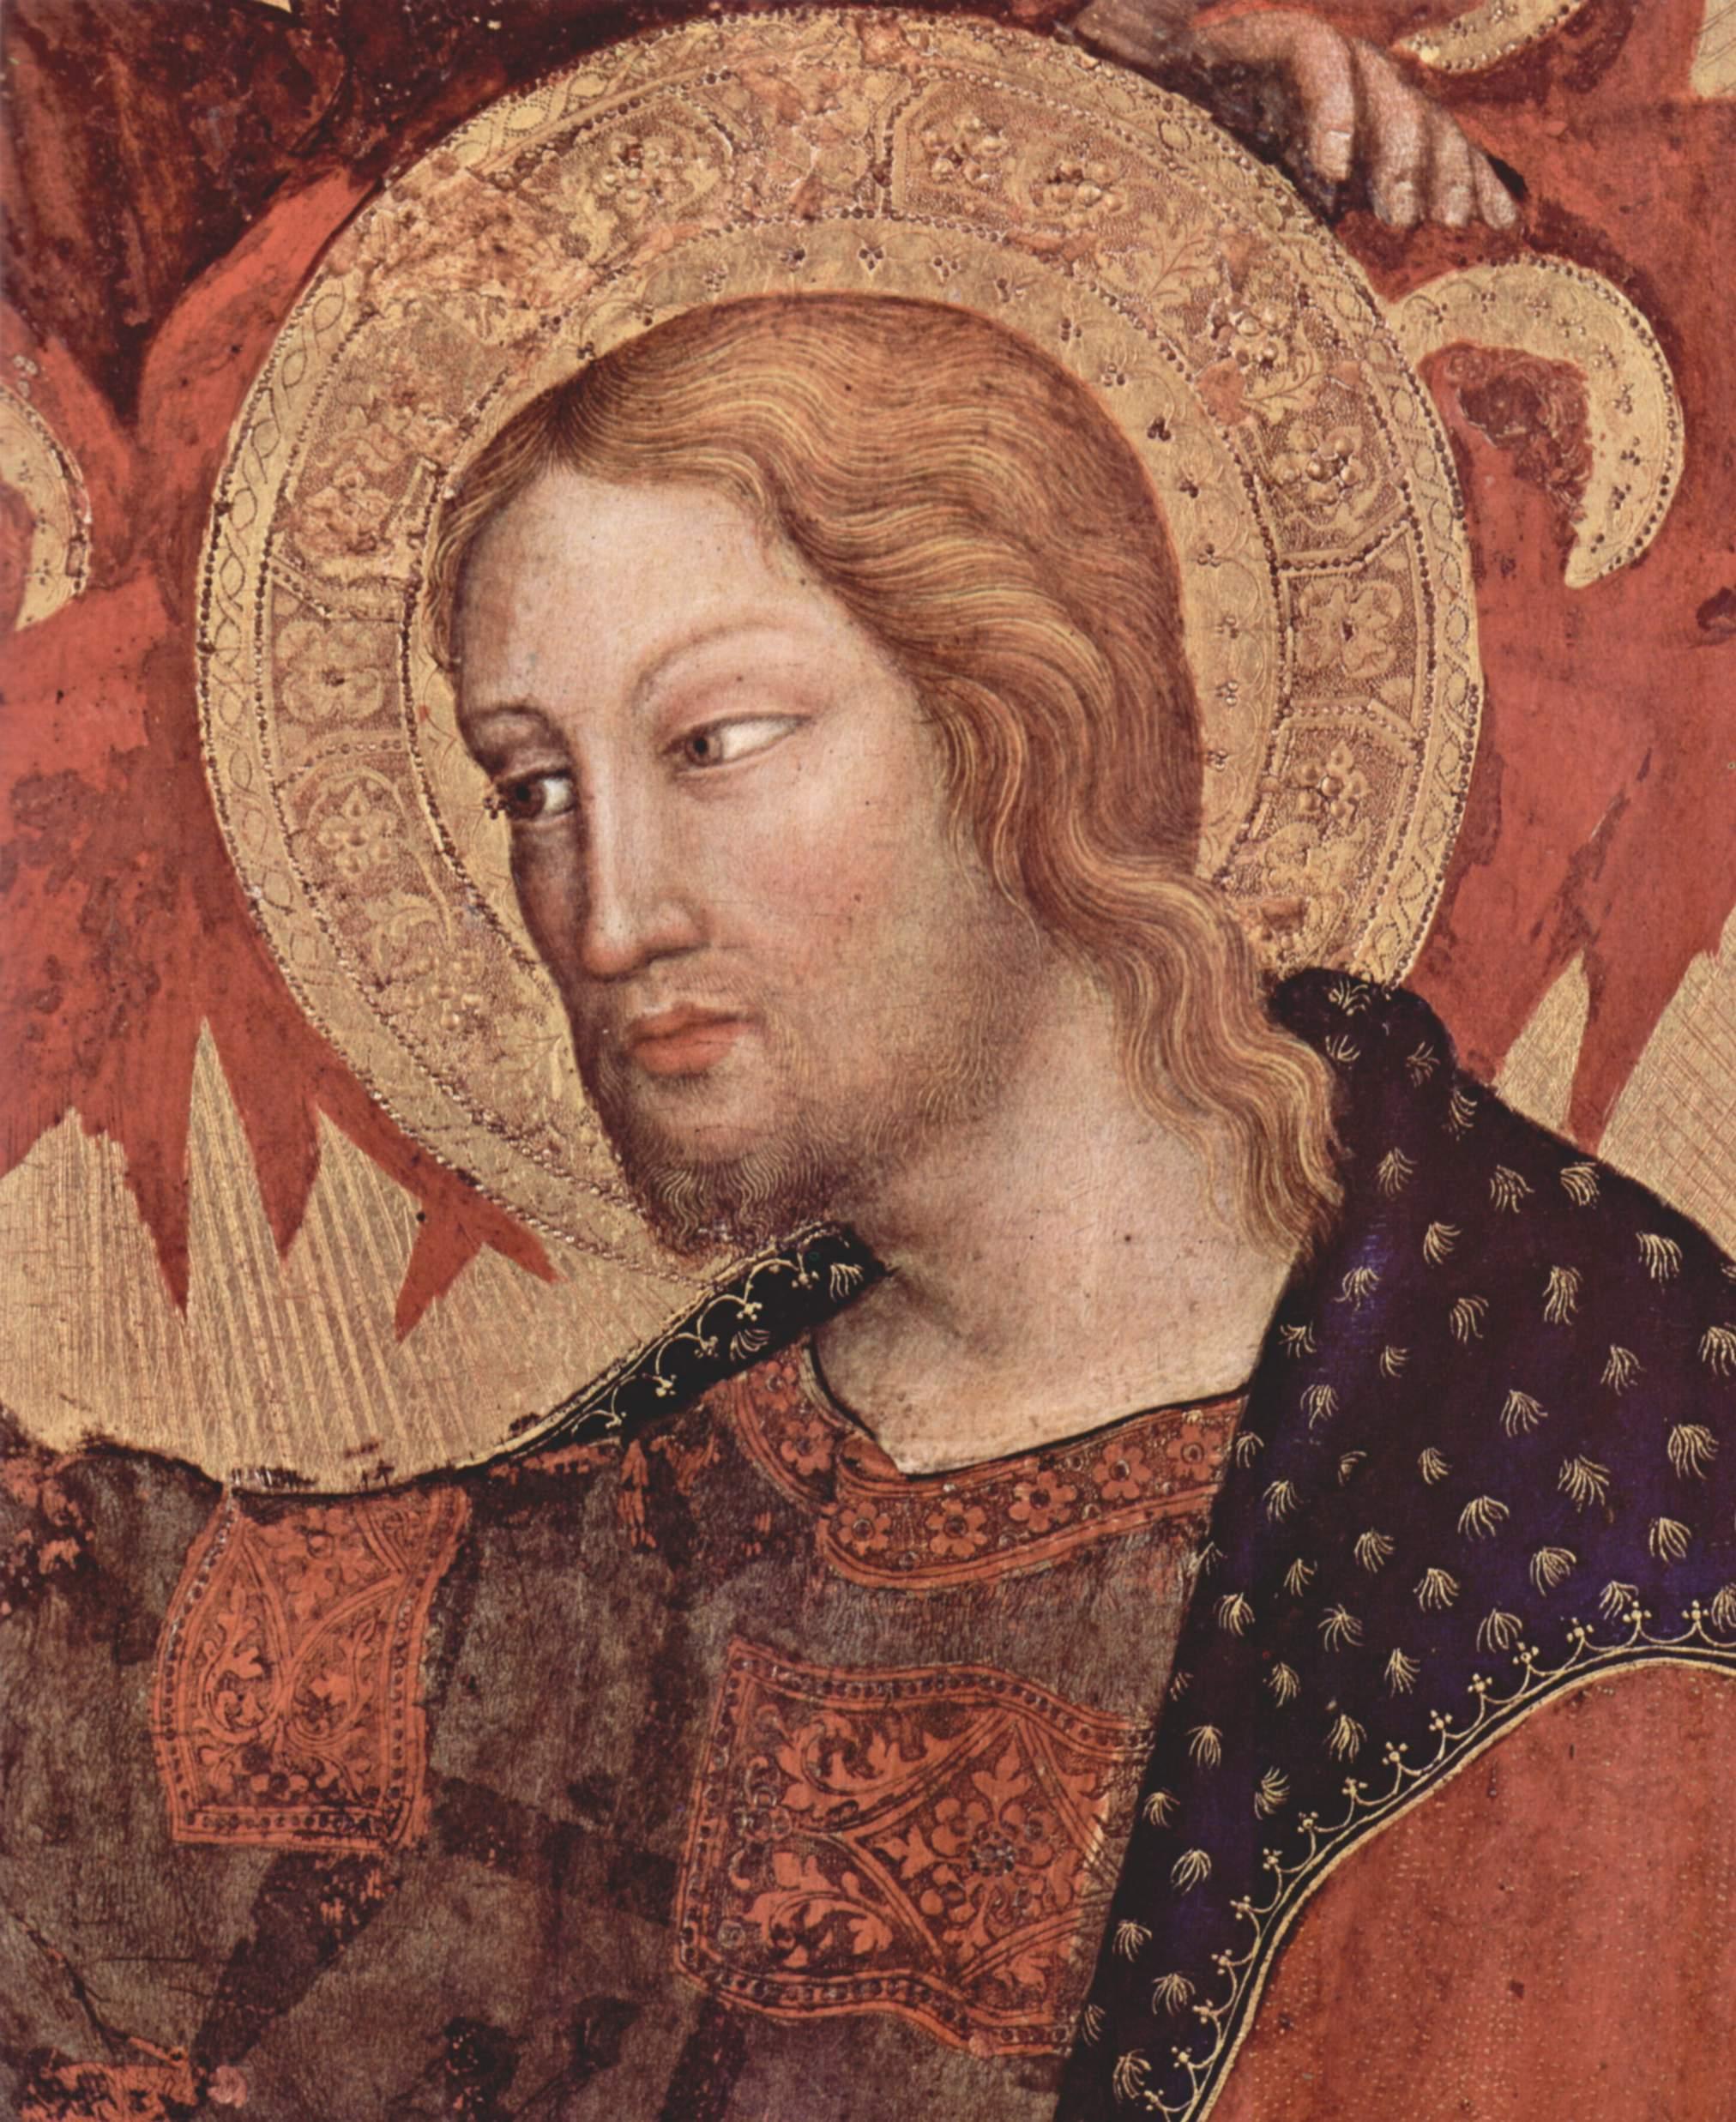 Коронование Марии [08], центральная часть. Коронование Марии. Фрагмент. Христос, Джентиле да Фабриано